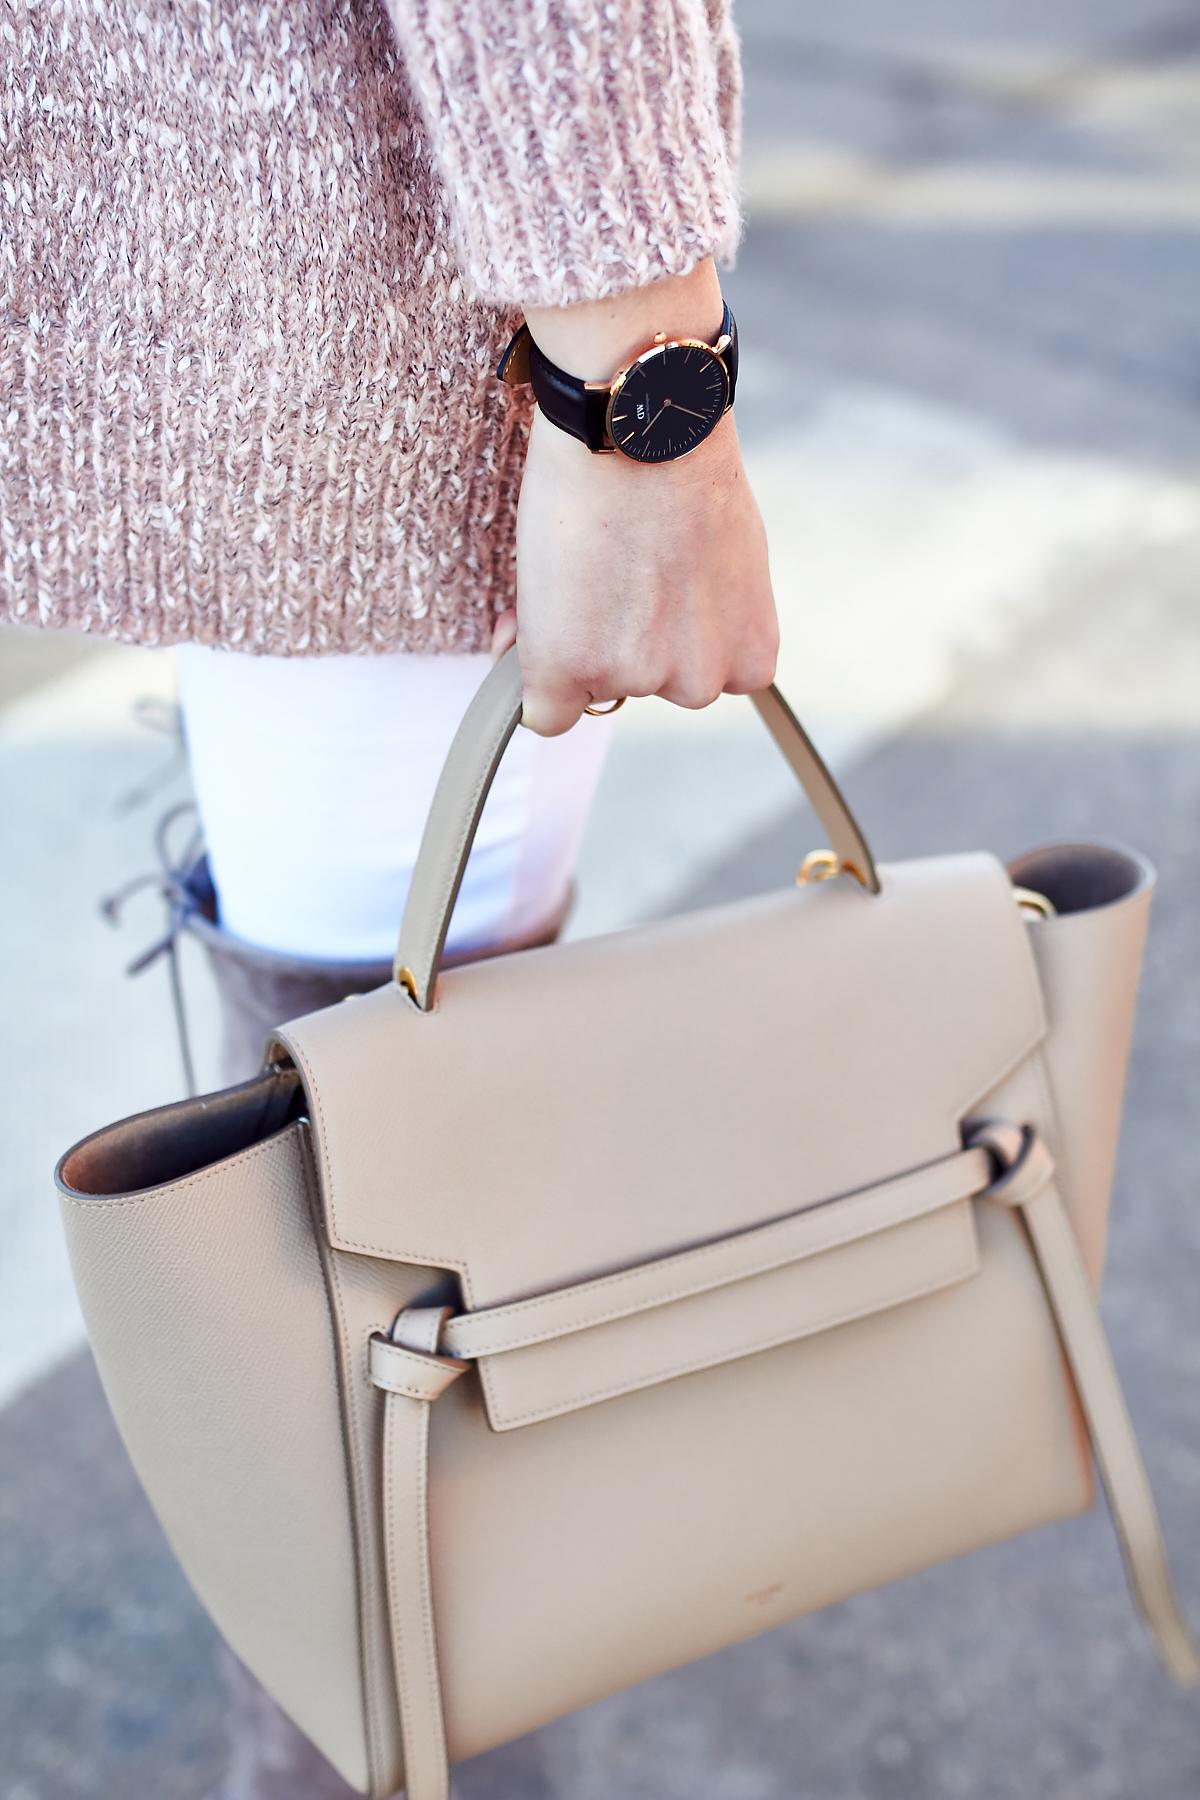 Celine Tie Belt Bag, Daniel Wellington Watch